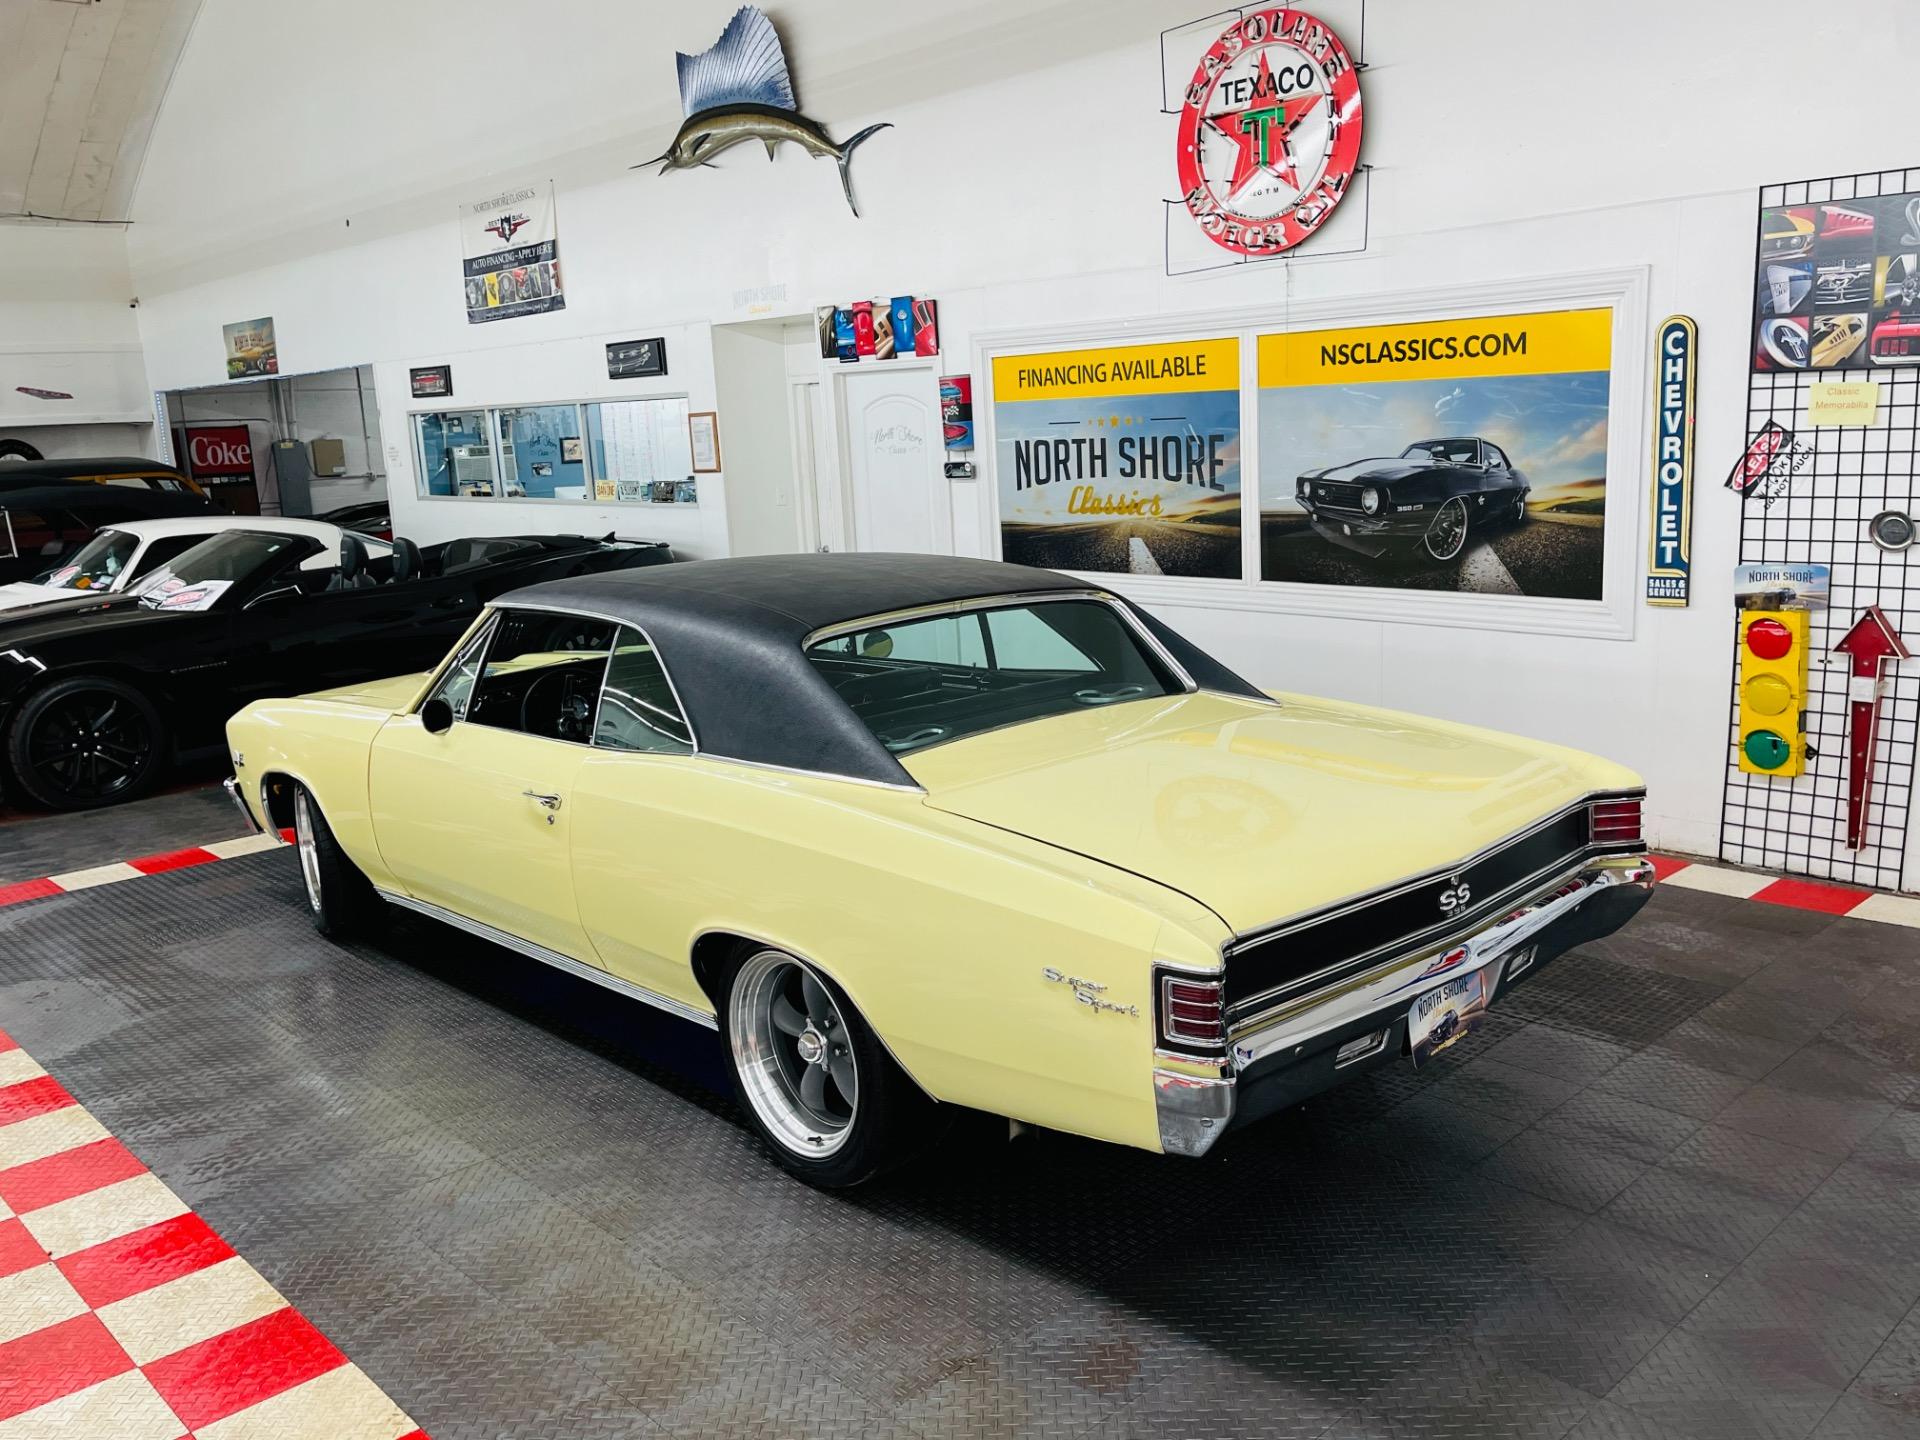 Used 1967 Chevrolet Chevelle -SUPER SPORT TRIBUTE - PERIOD CORRECT 396 ENGINE - SEE VIDEO - | Mundelein, IL